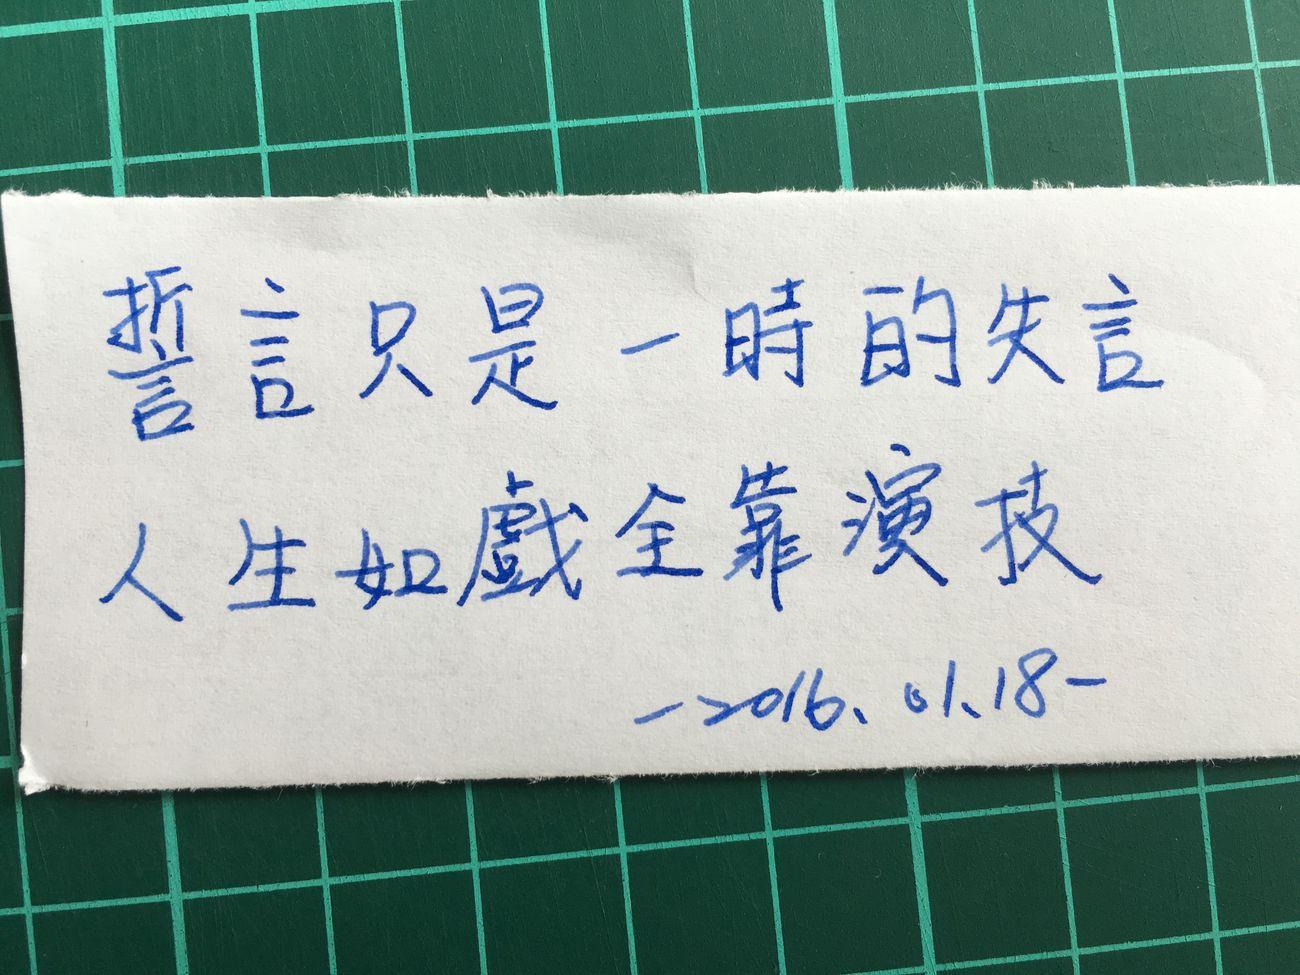 January Taiwan Taiwanese Kaohsiung 臺灣 高雄 鋼筆 一月 中文 文具 墨水 前鎮區